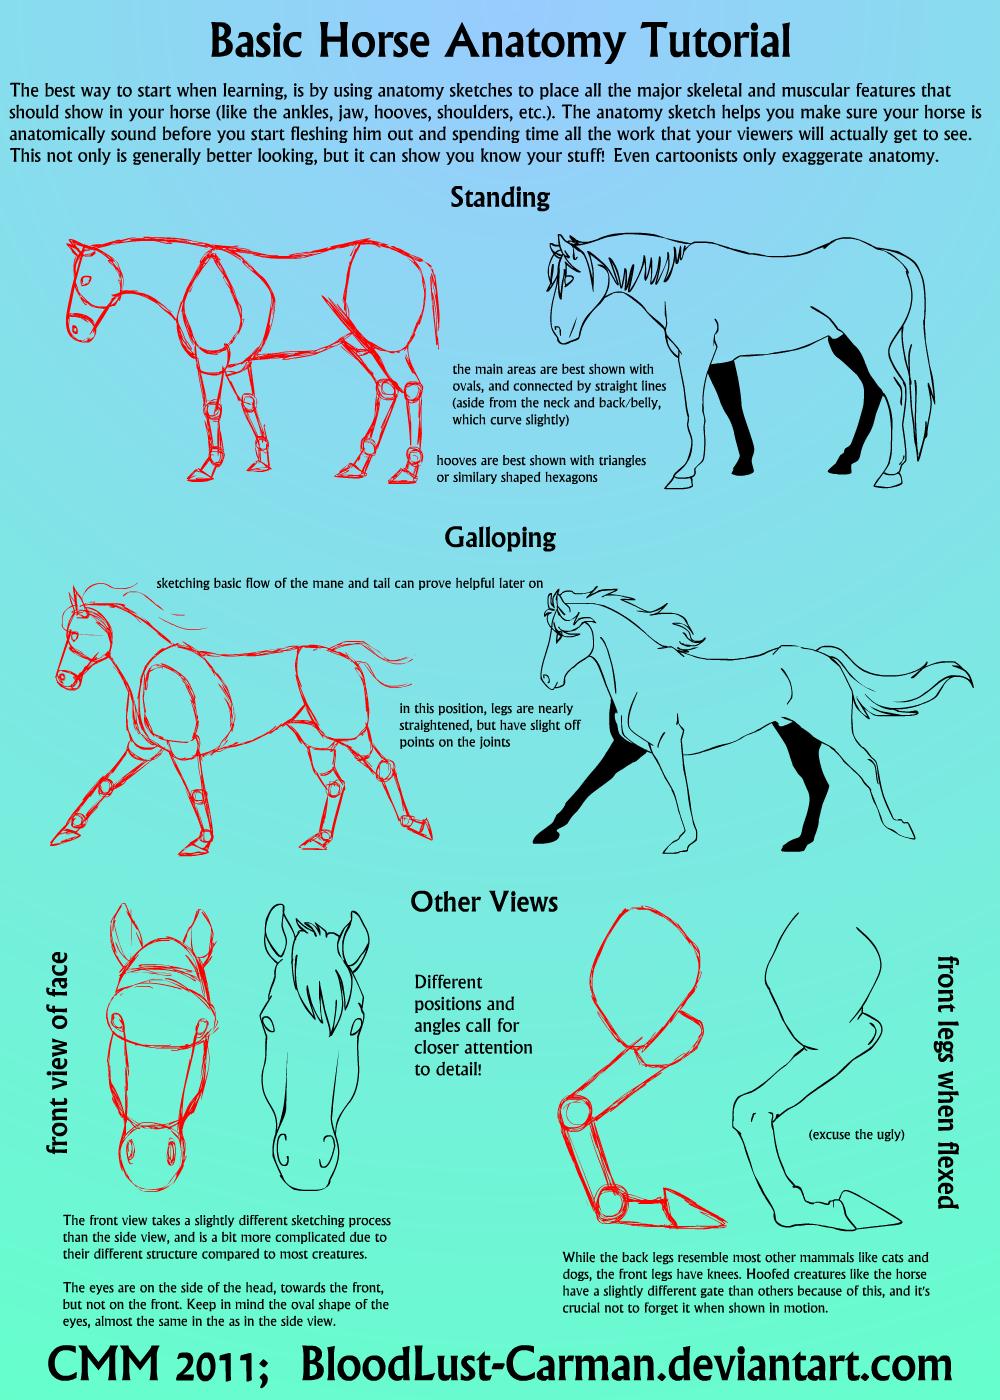 Horse Anatomy Tutorial by BloodLust-Carman.deviantart.com on ...